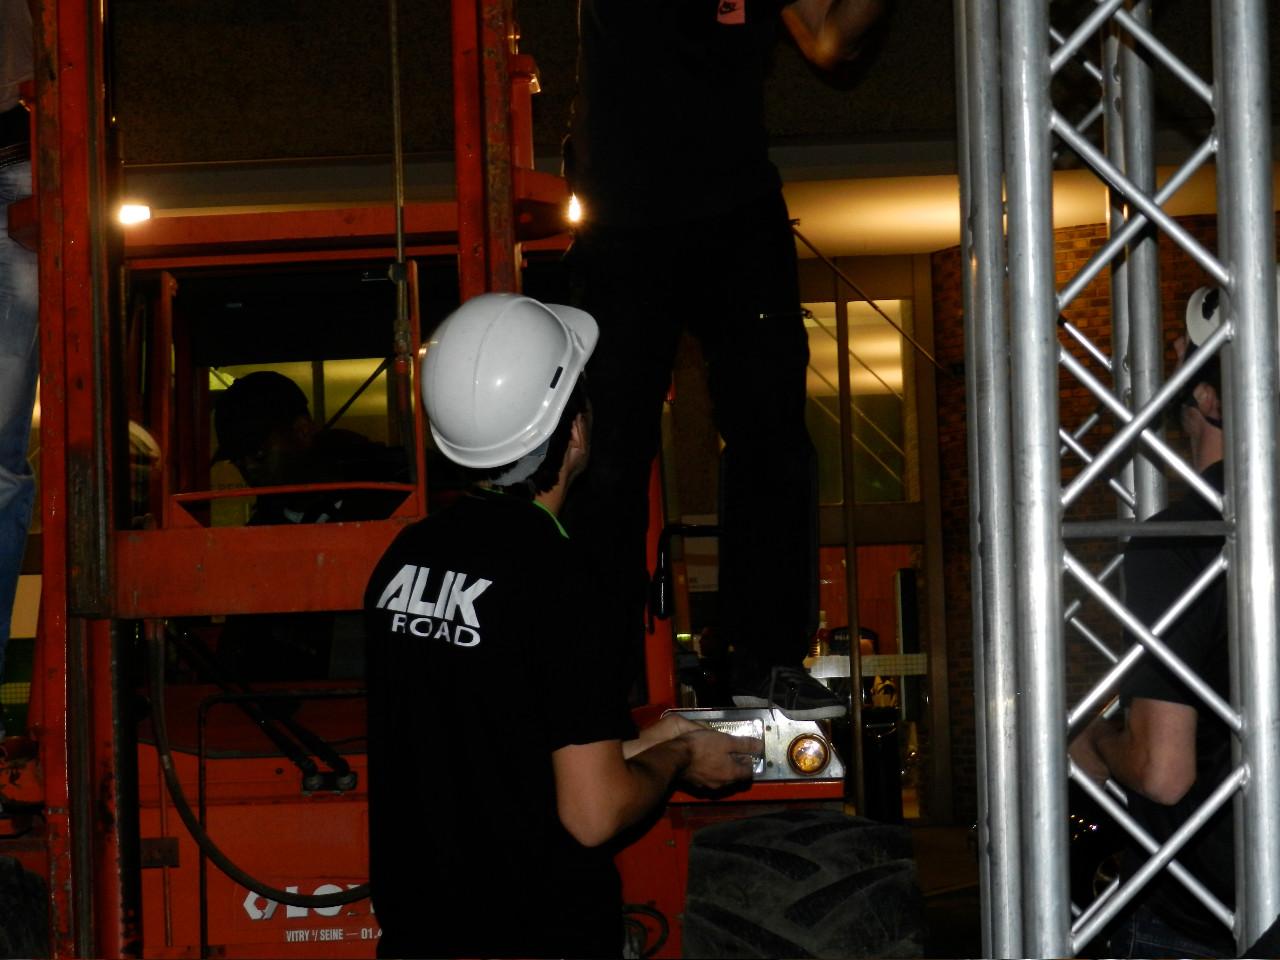 Alik Road - Prestations de roads et techniciens audiovisuels